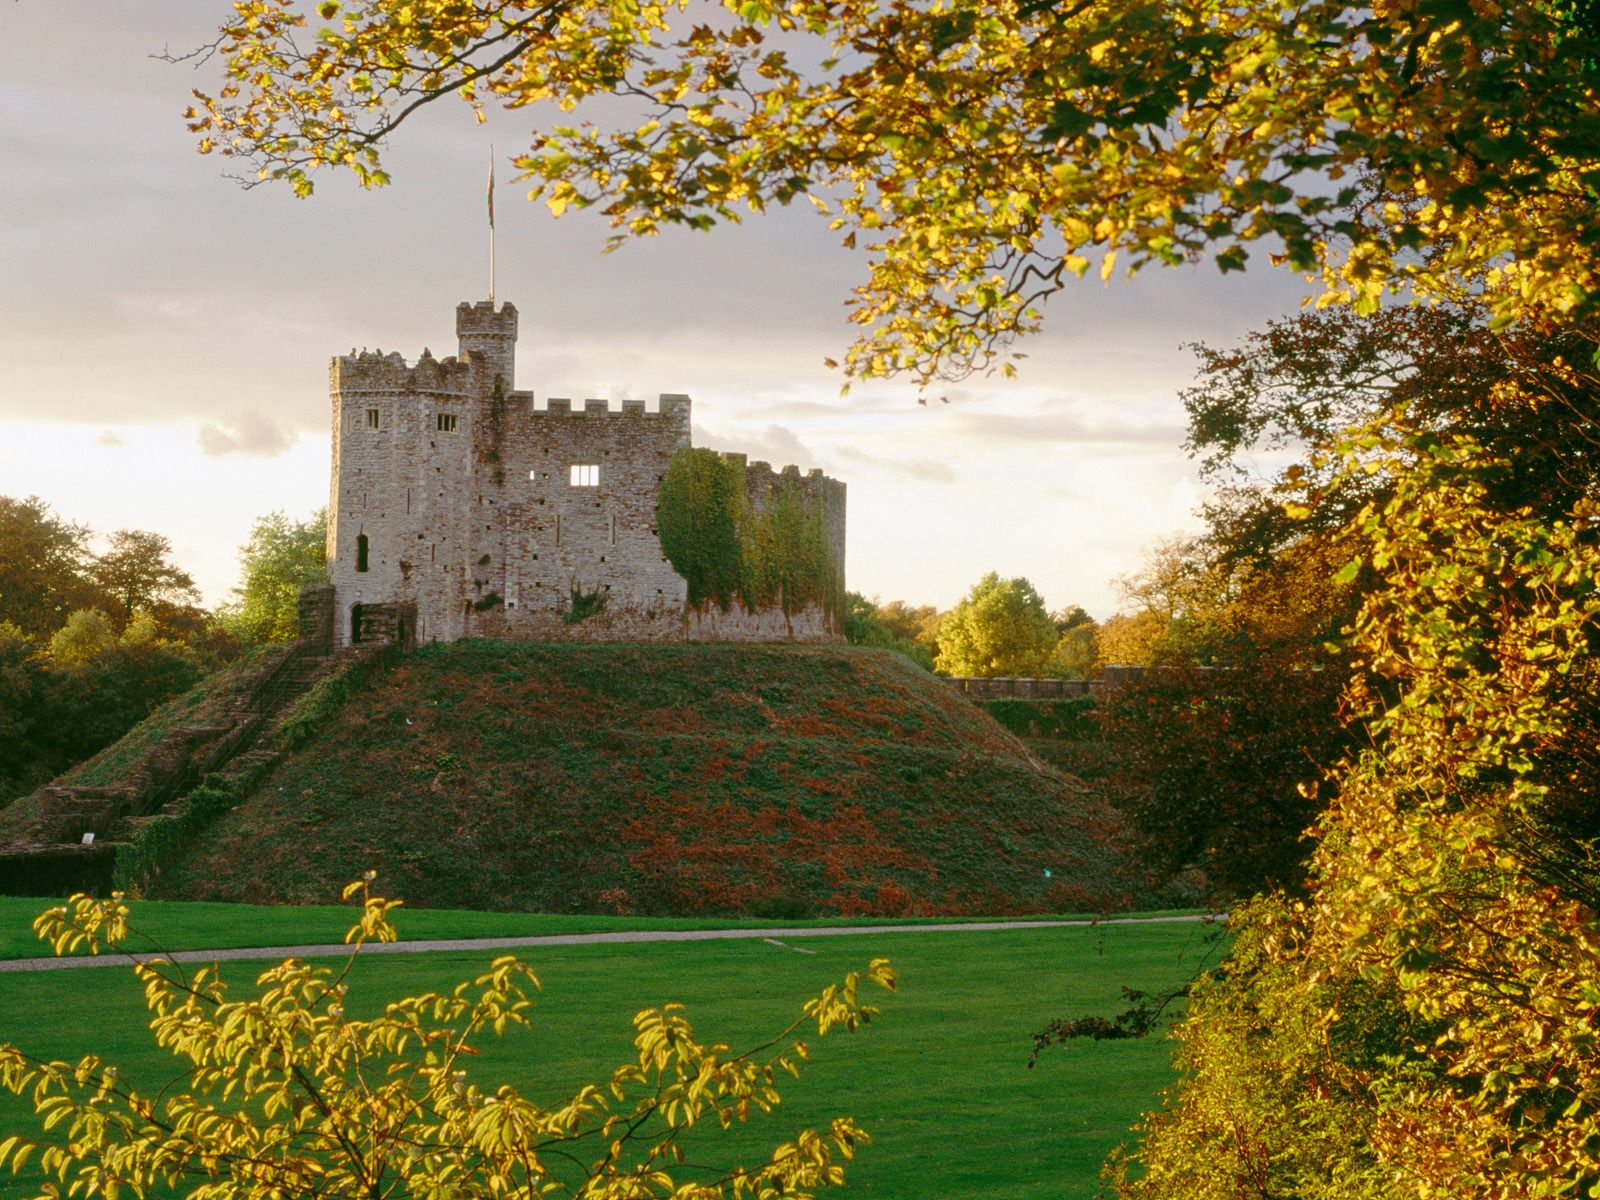 United Kingdom photo Cardiff Castle Wales United Kingdom wallpaper 1600x1200